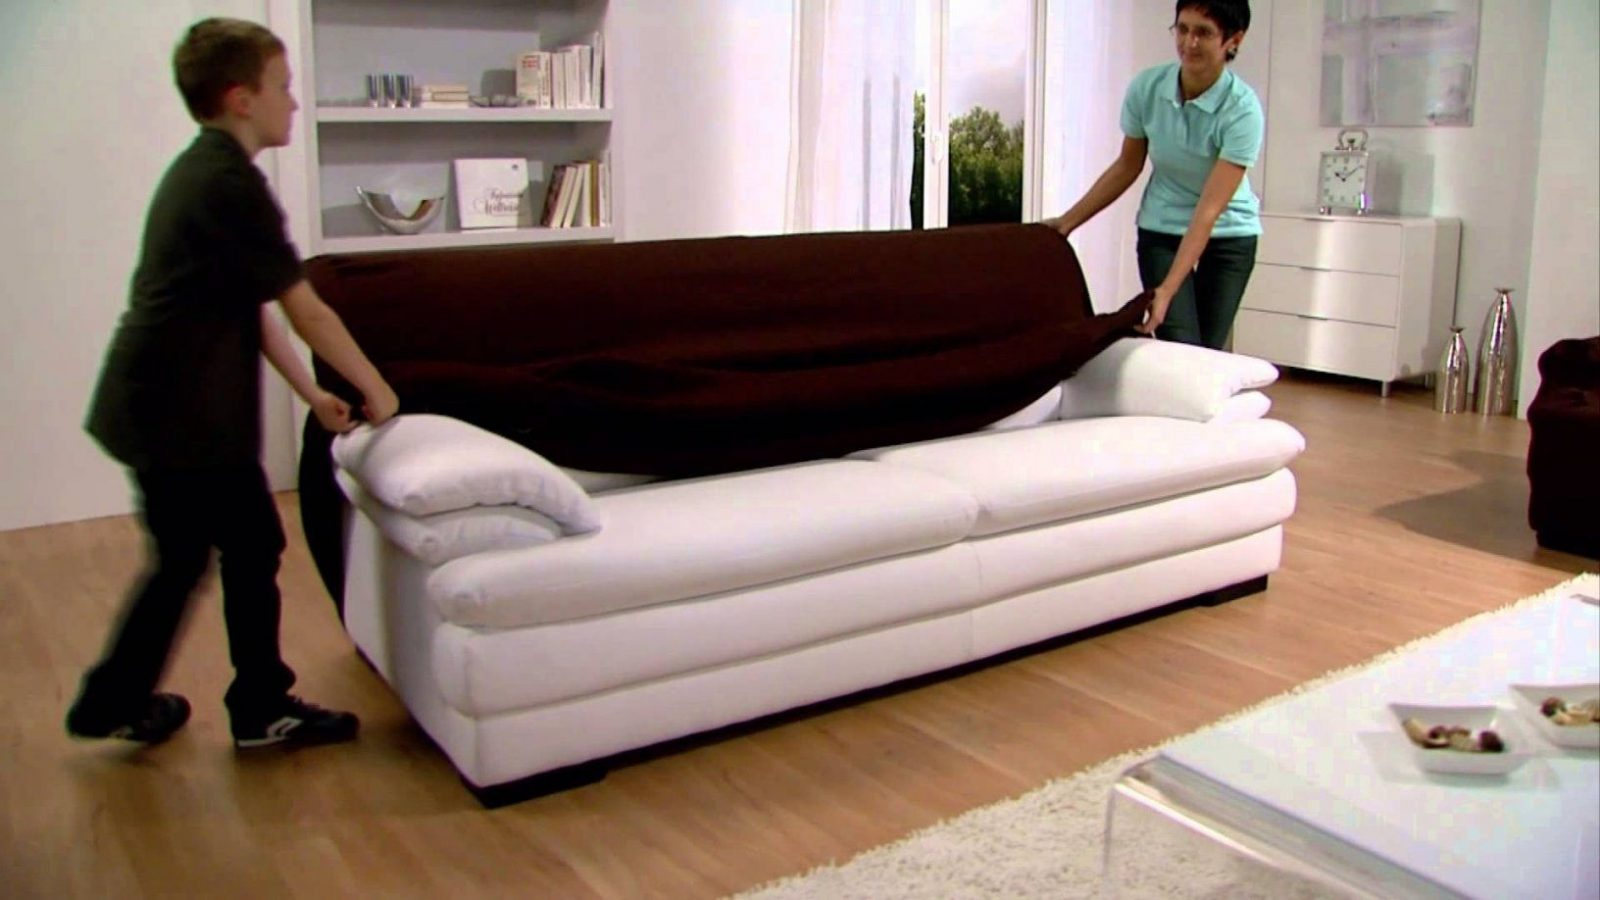 Couchgarnitur Neu Beziehen Kosten Gute Sofas Elegant Sofa Neu